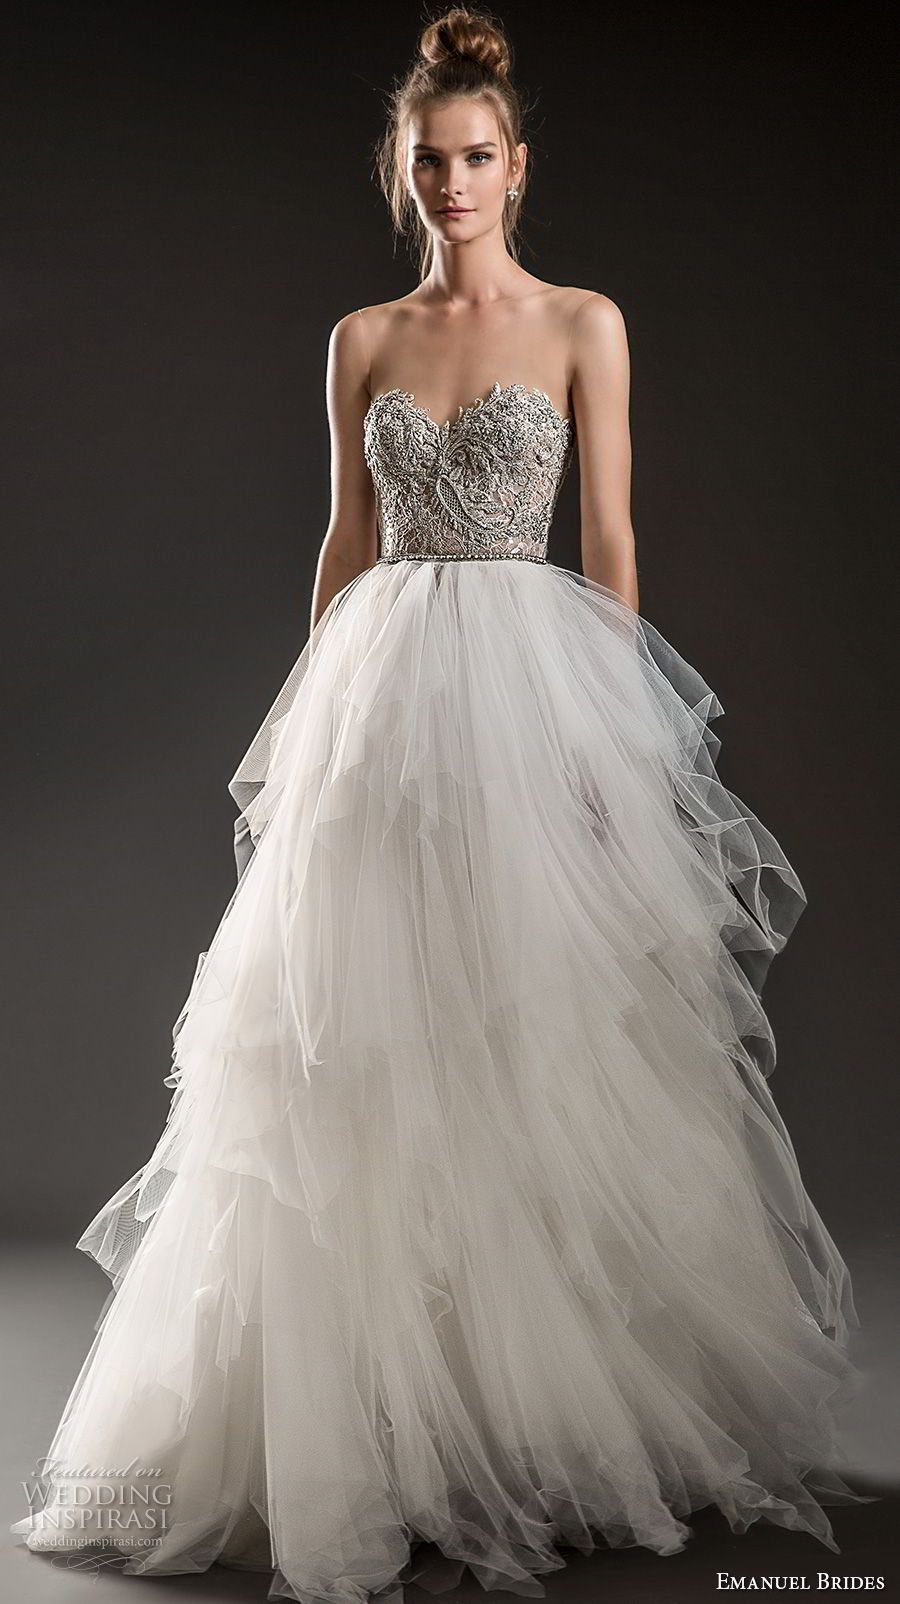 Belles wedding dress  Emanuel Brides  Wedding Dresses  Style  Pinterest  Bodice